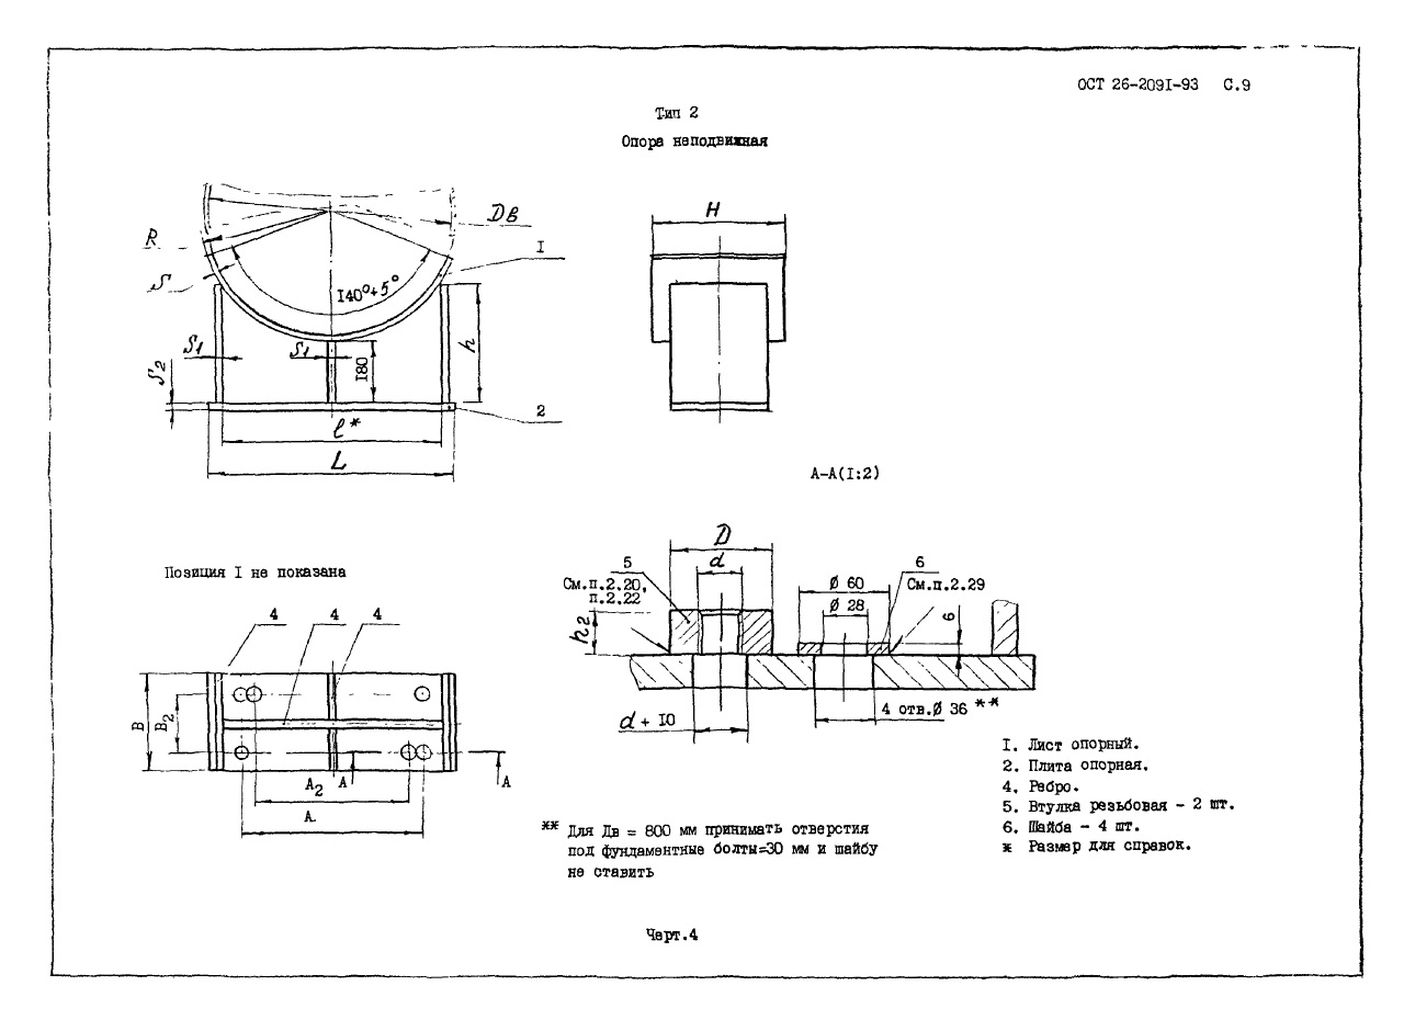 Опоры тип 2 ОСТ 26-2091-93 стр.2